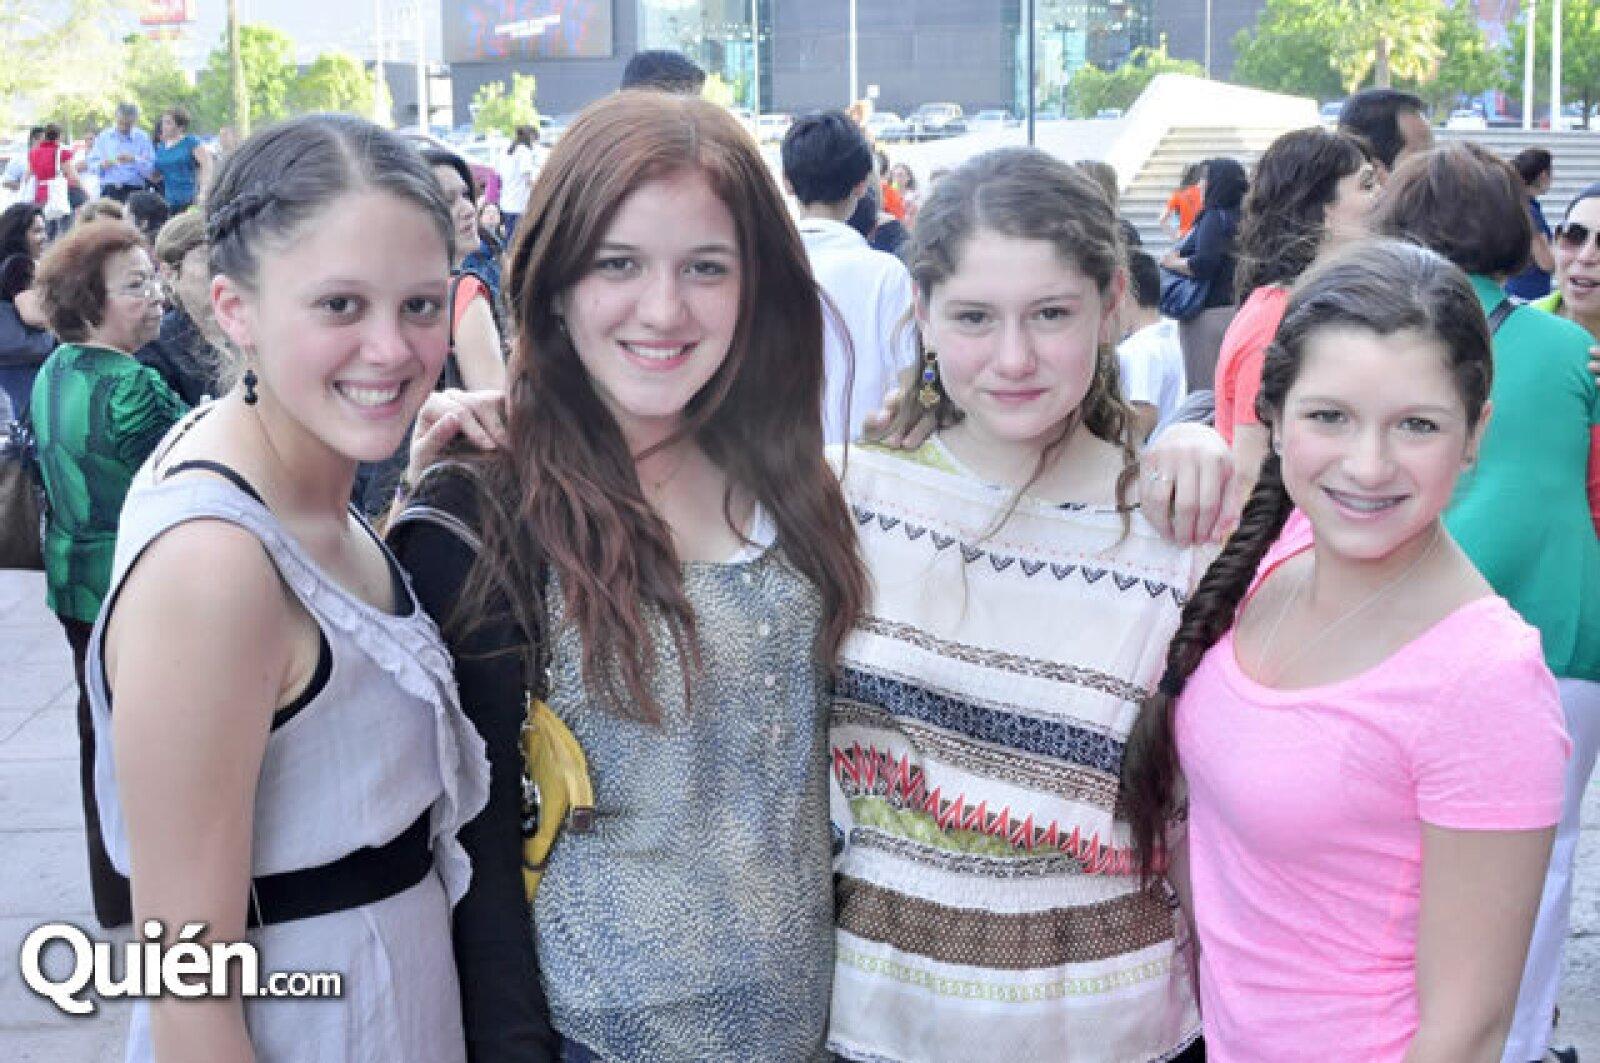 Ana Goya, Daniela Vela, Oliva Cuervo y Alma Lozano